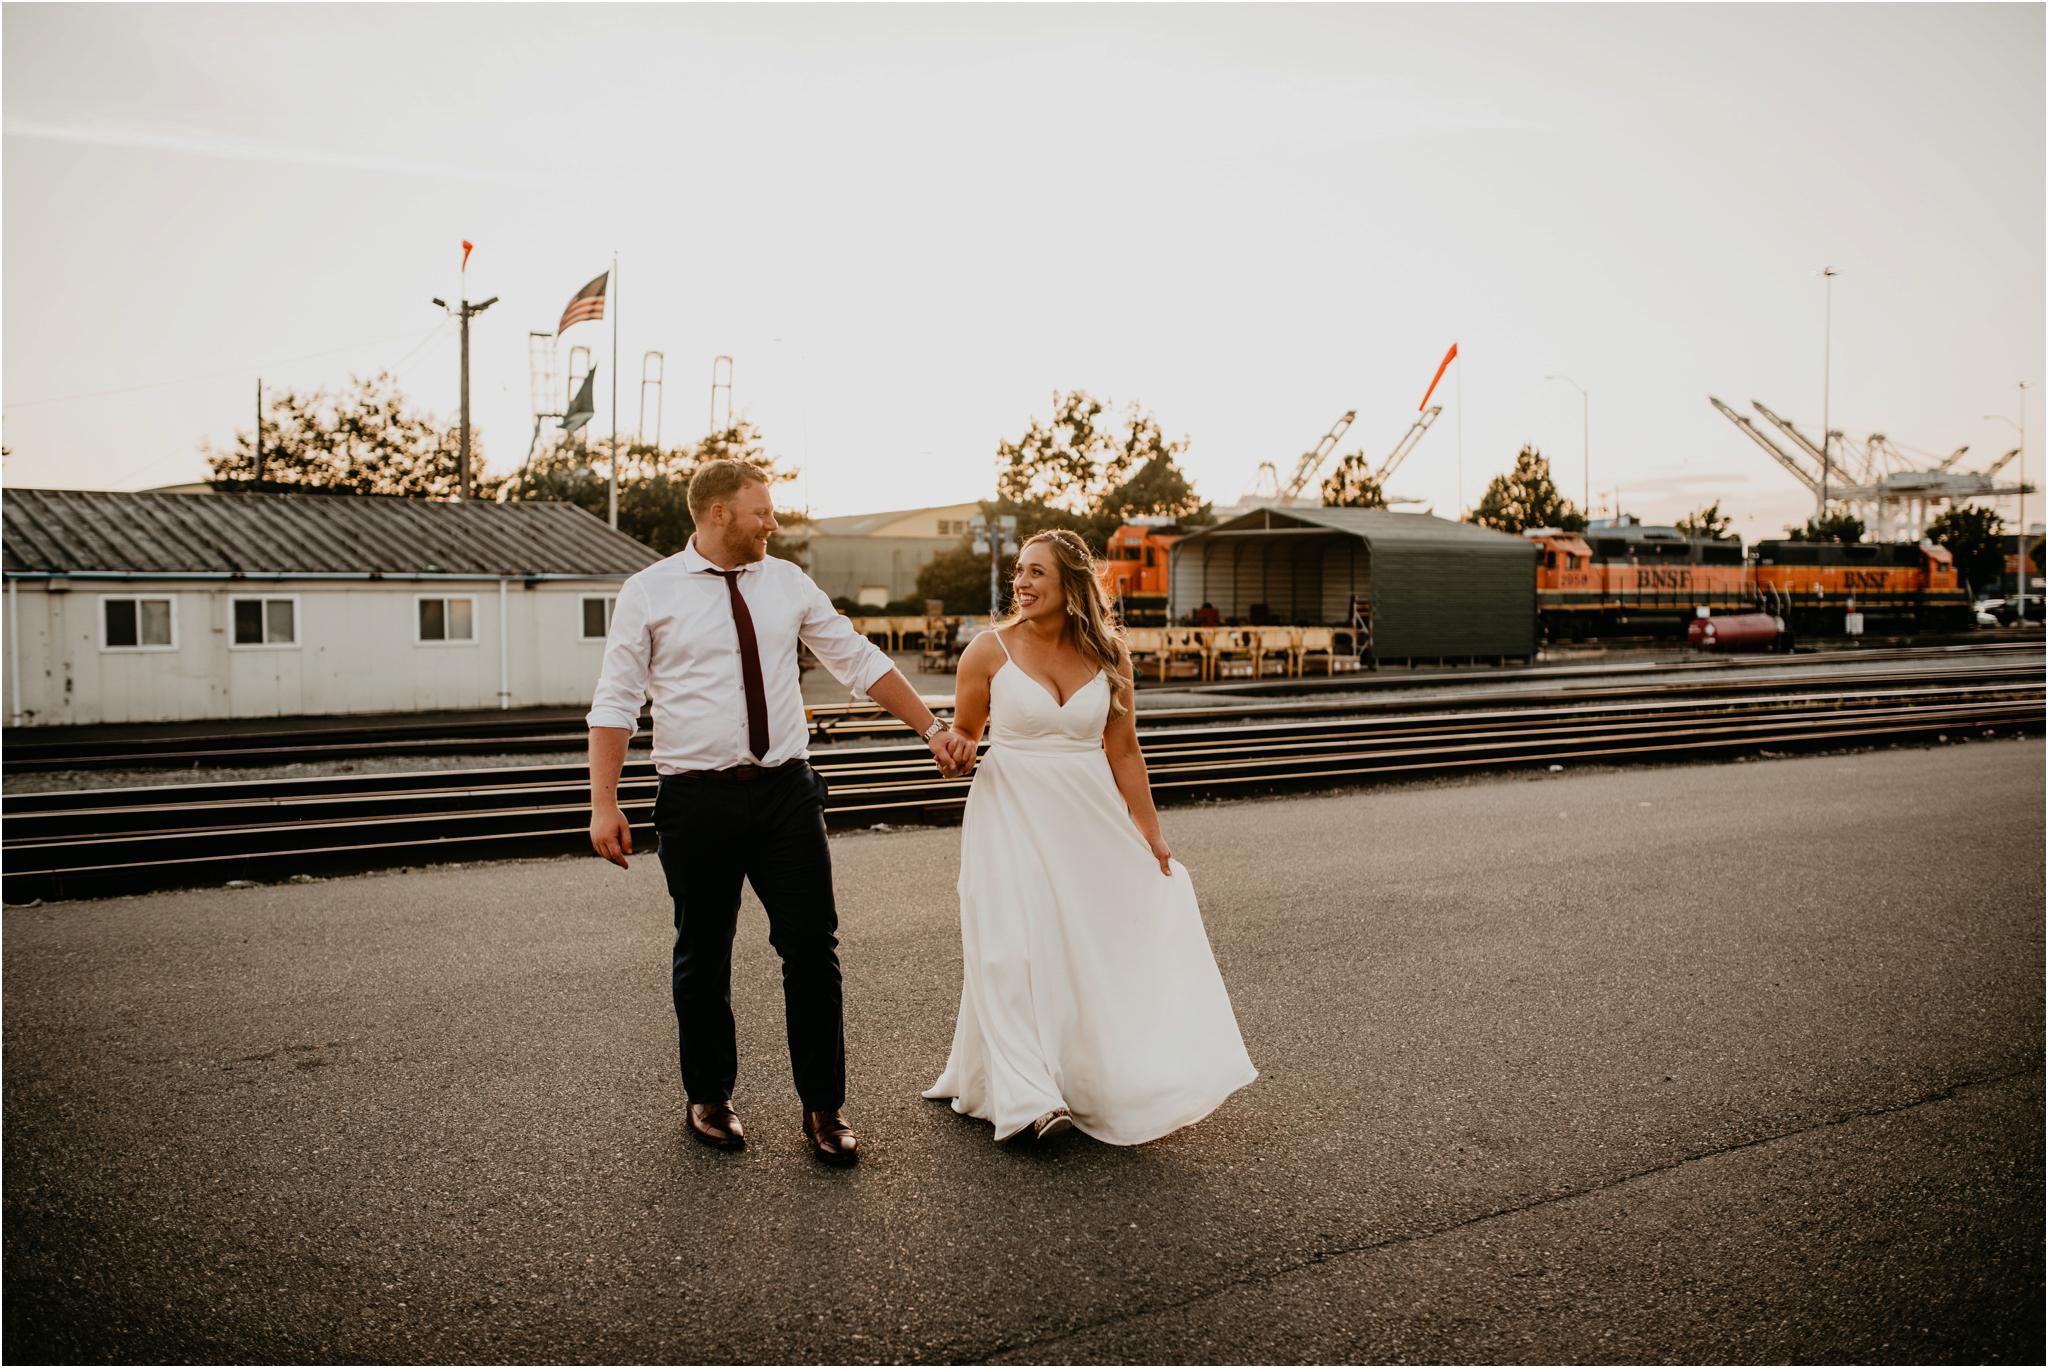 laura-and-matt-metropolist-urban-seattle-wedding-photographer-136.jpg